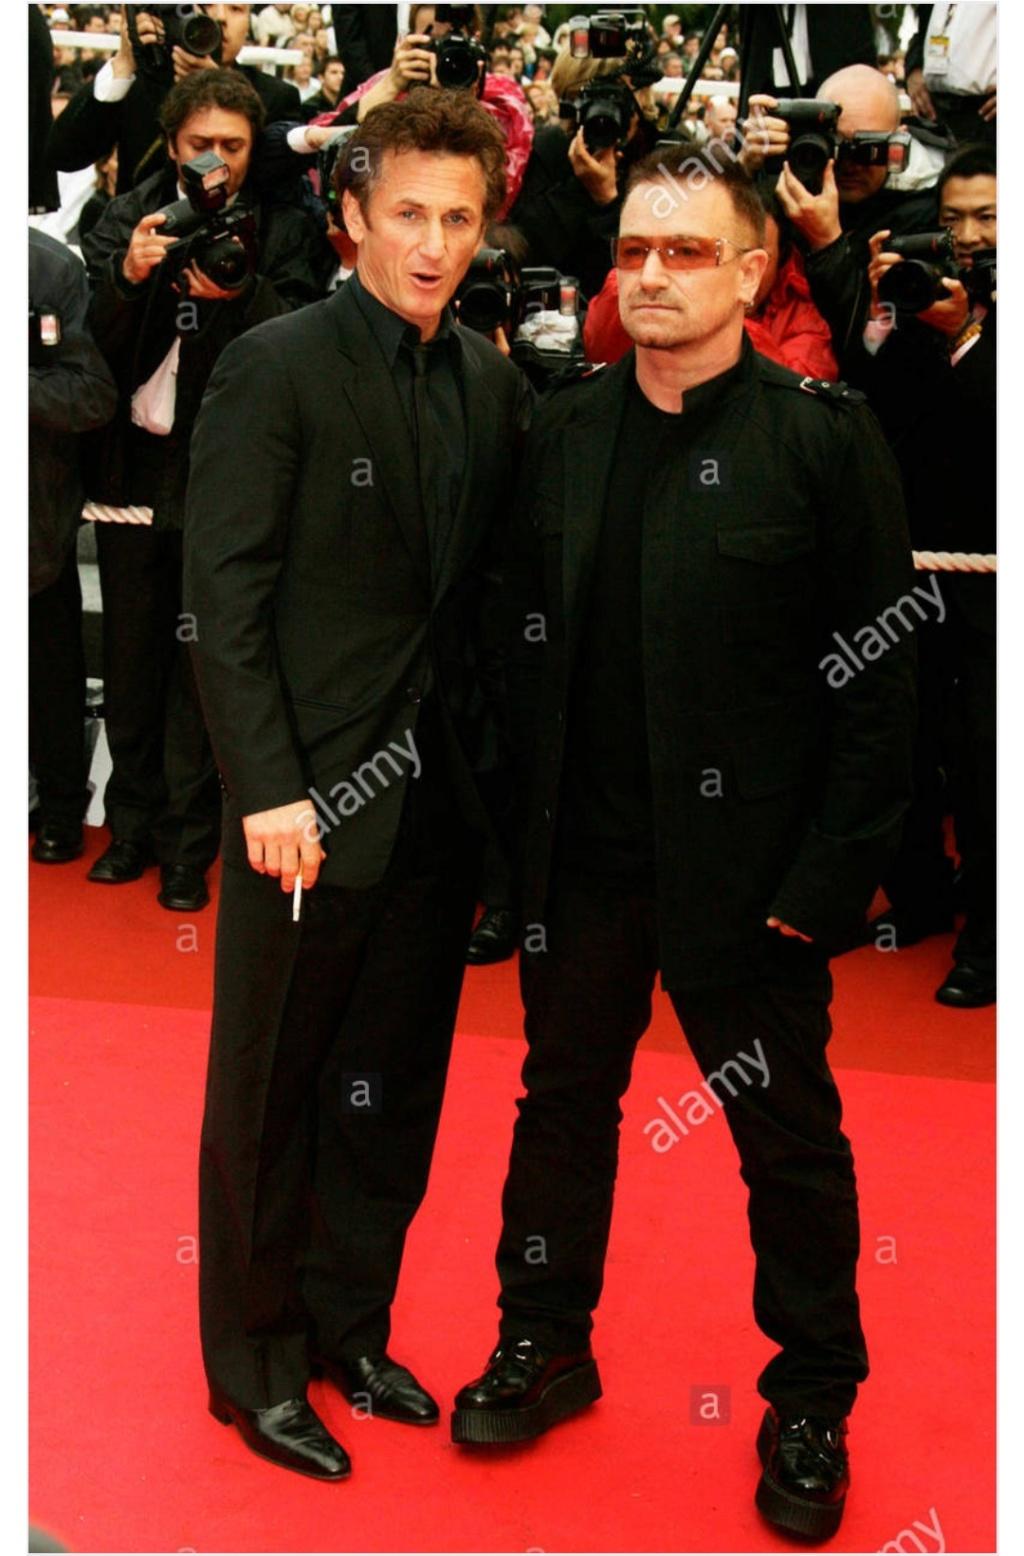 ¿Cuánto mide Bono? (U2) - Altura - Real height Img_1290